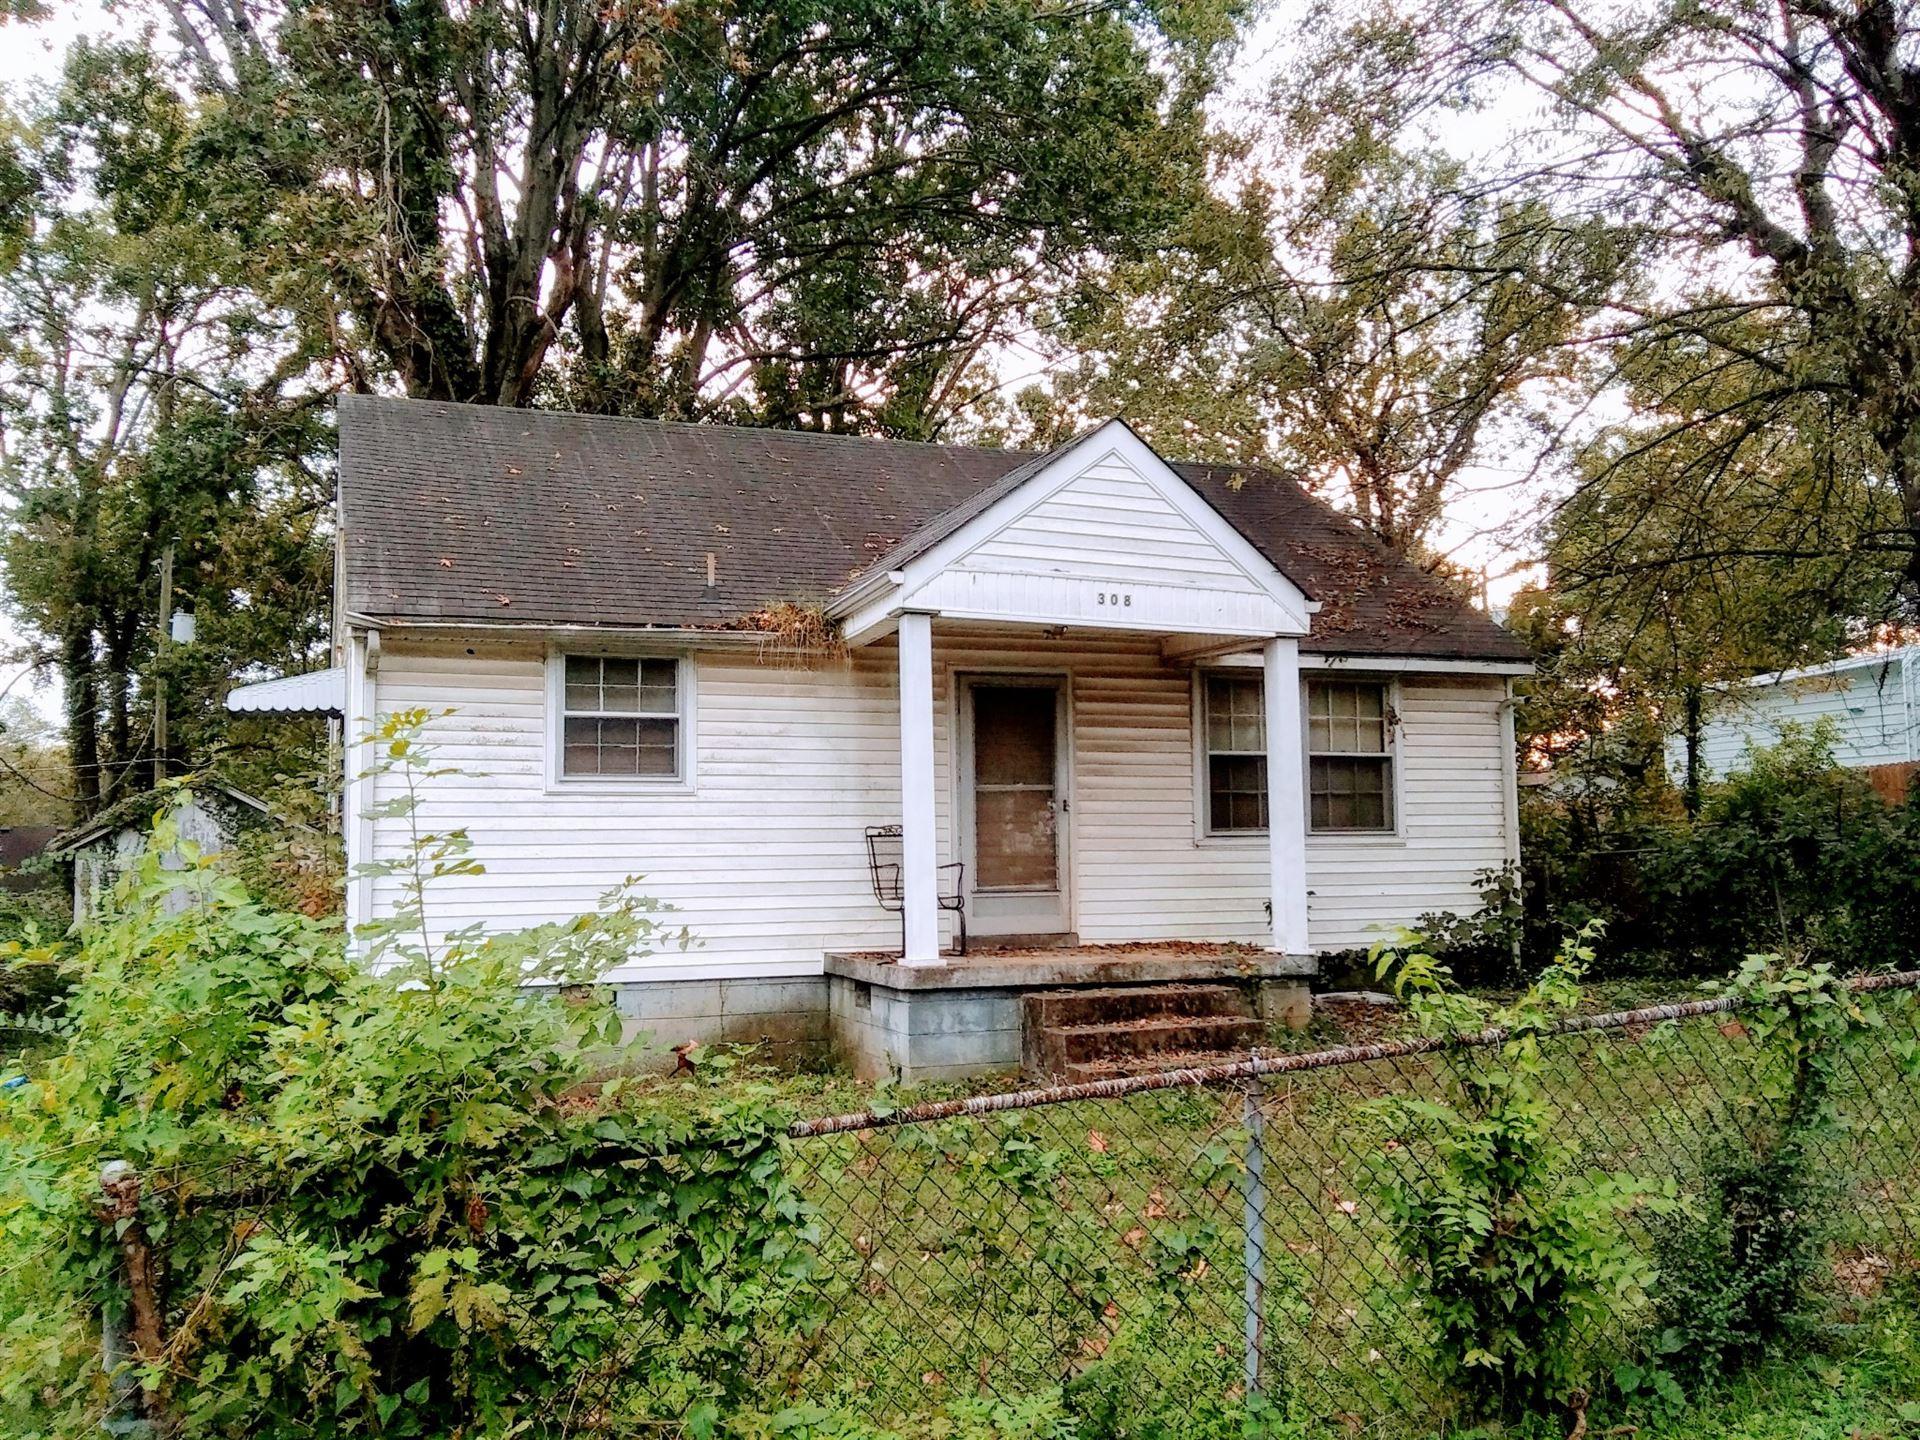 308 Pullen Ave, Nashville, TN 37207 - MLS#: 2299889